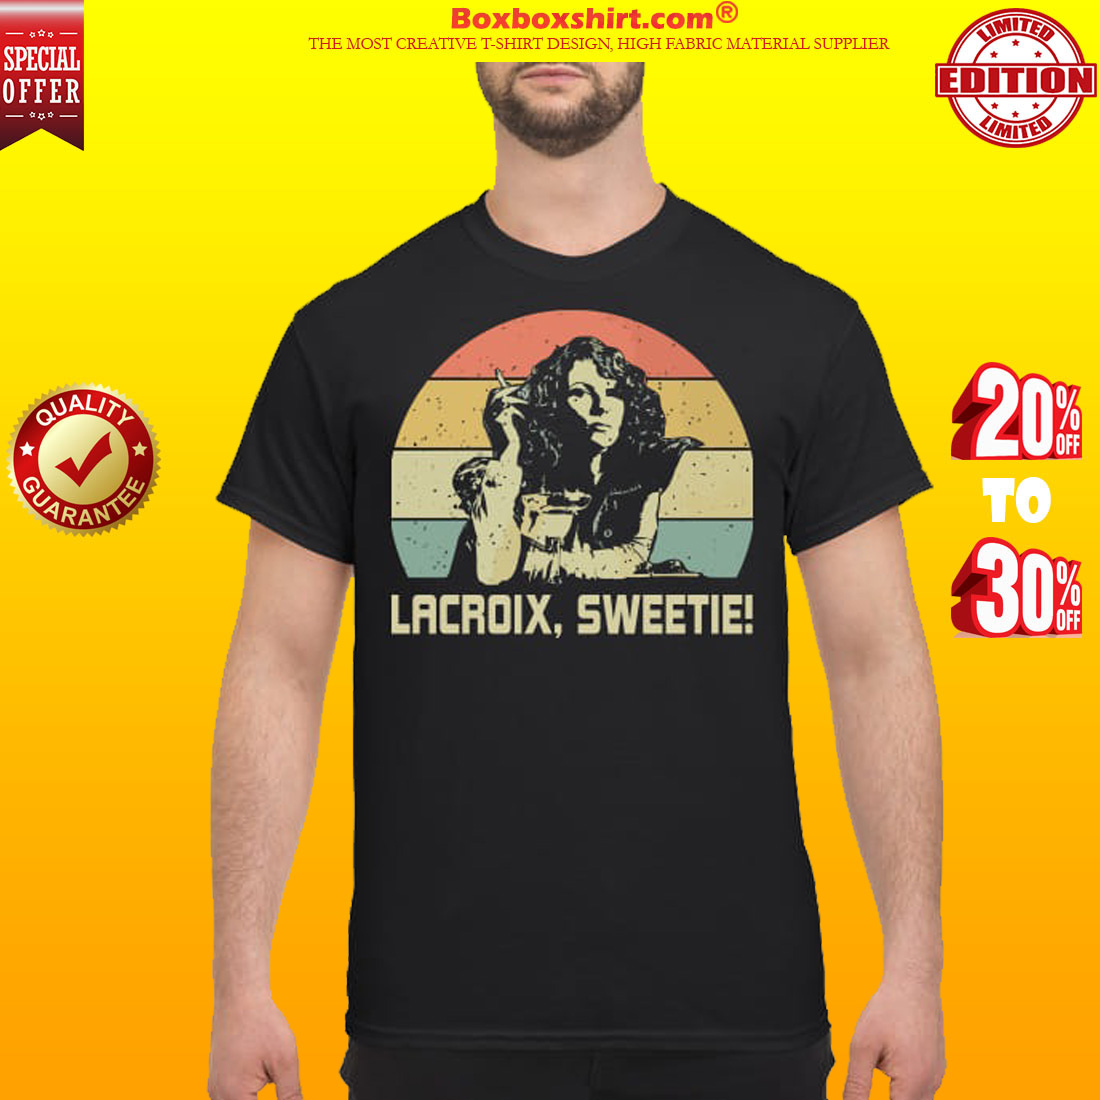 Eddy Lacroix sweetie classic shirt